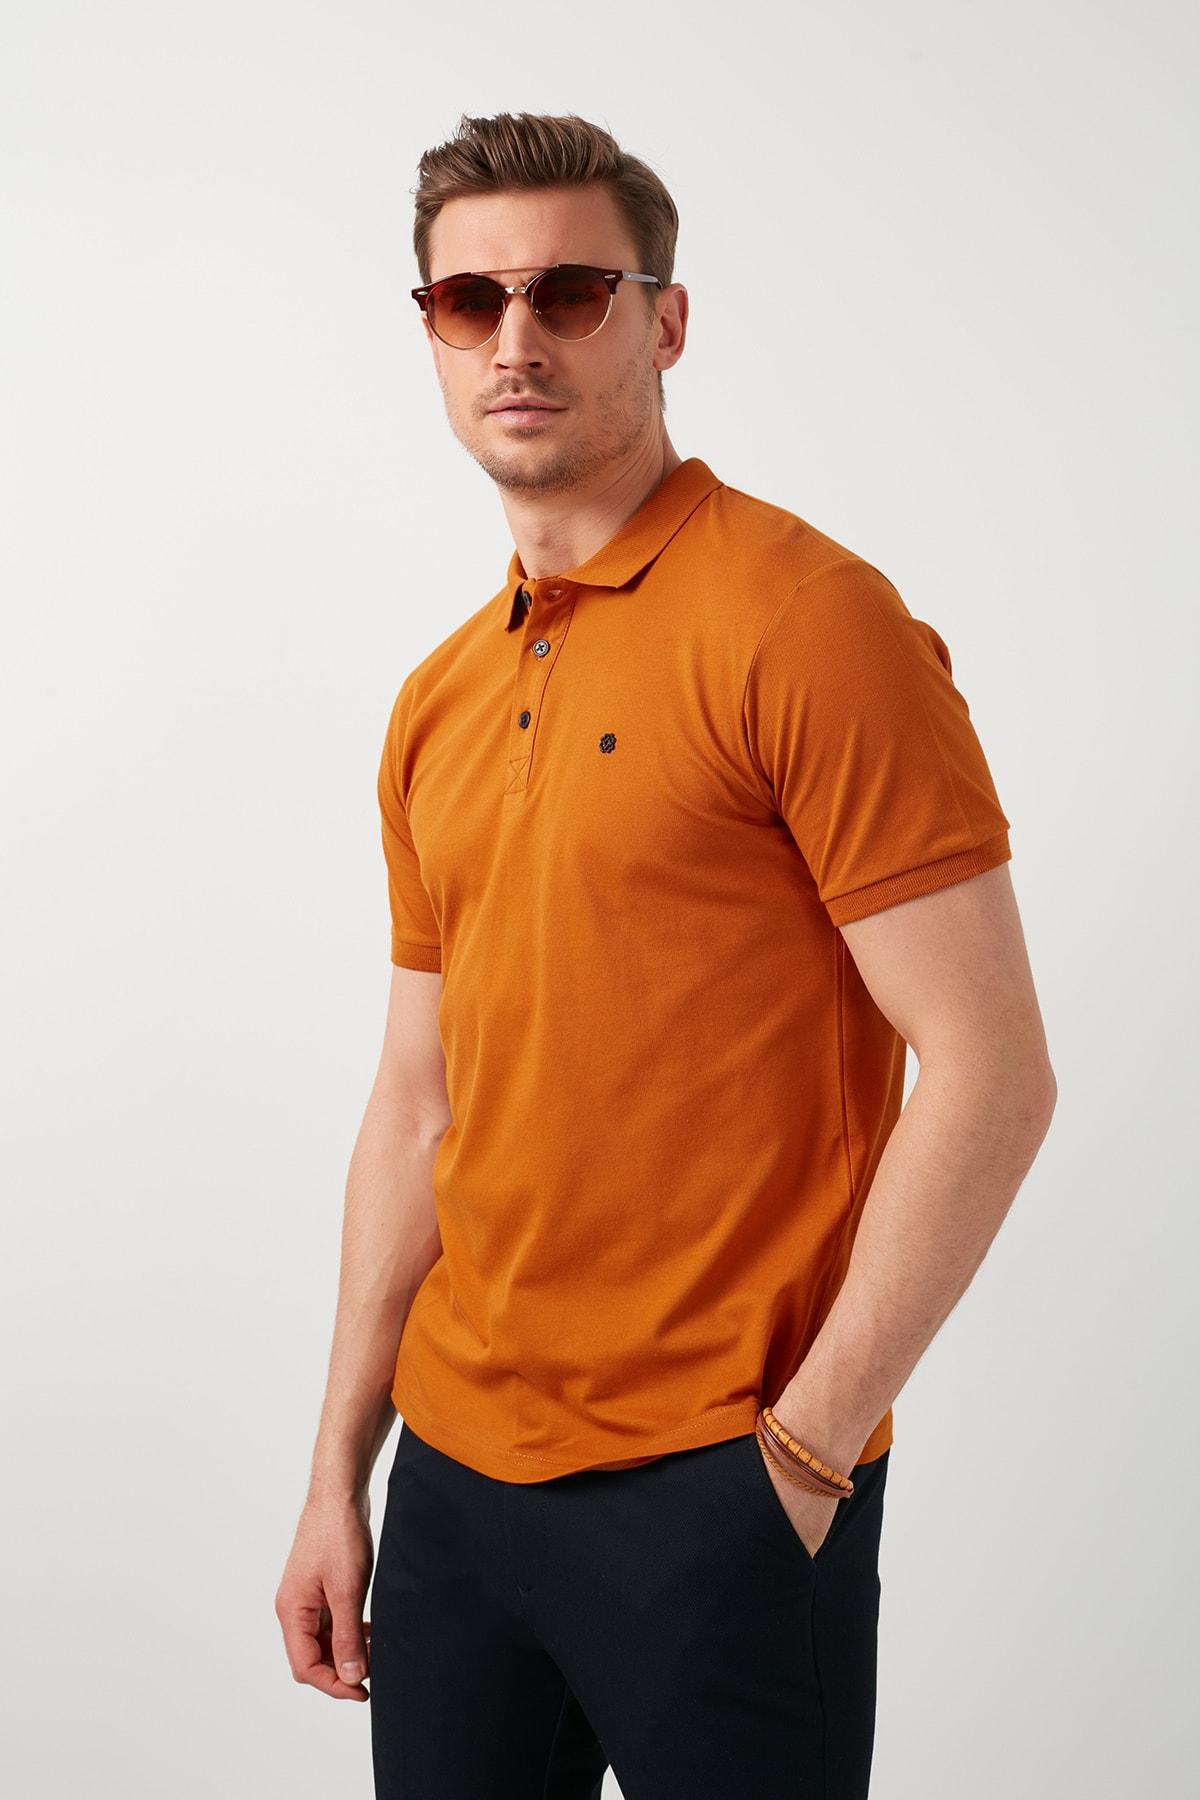 Erkek Taba Kısa Kol Düğmeli Polo Yaka T-Shirt